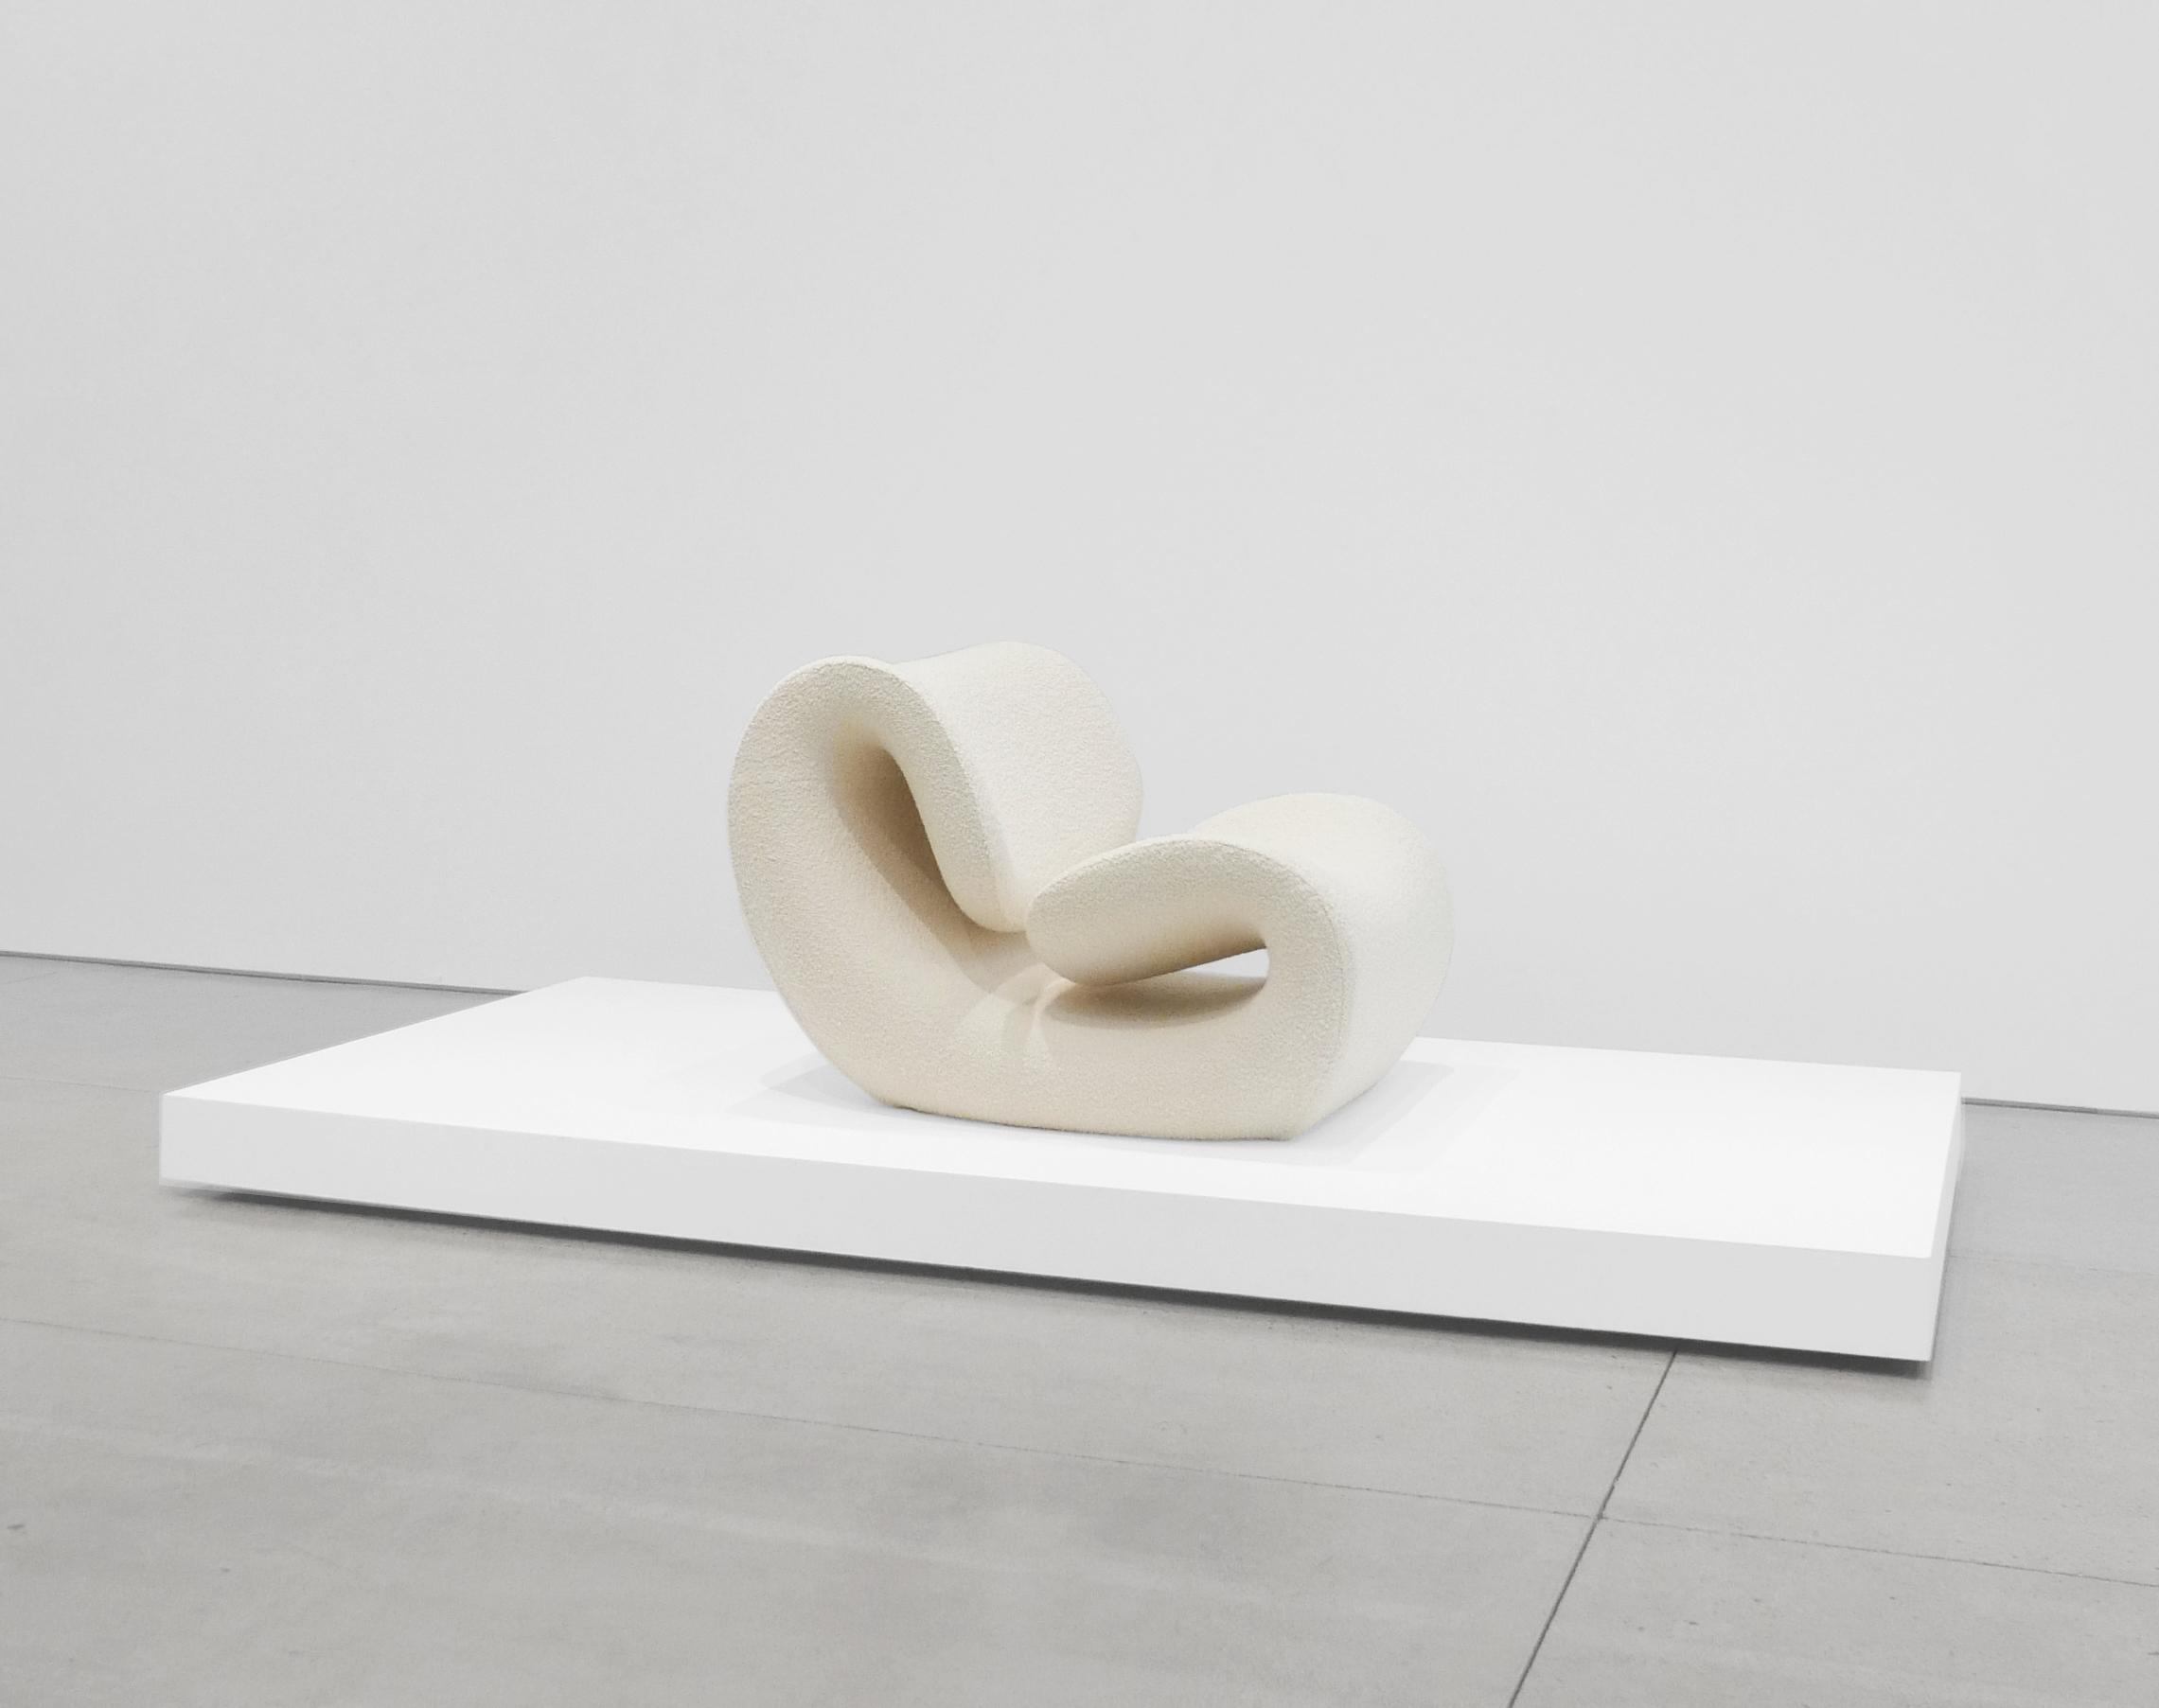 Jean-Pierre Laporte, 'Esox' Chair, c. 1970-1974, Dedar Milano Boucle Wool, Fiberglass, 35.5 H x 37 W x 28 D inches_4.jpg